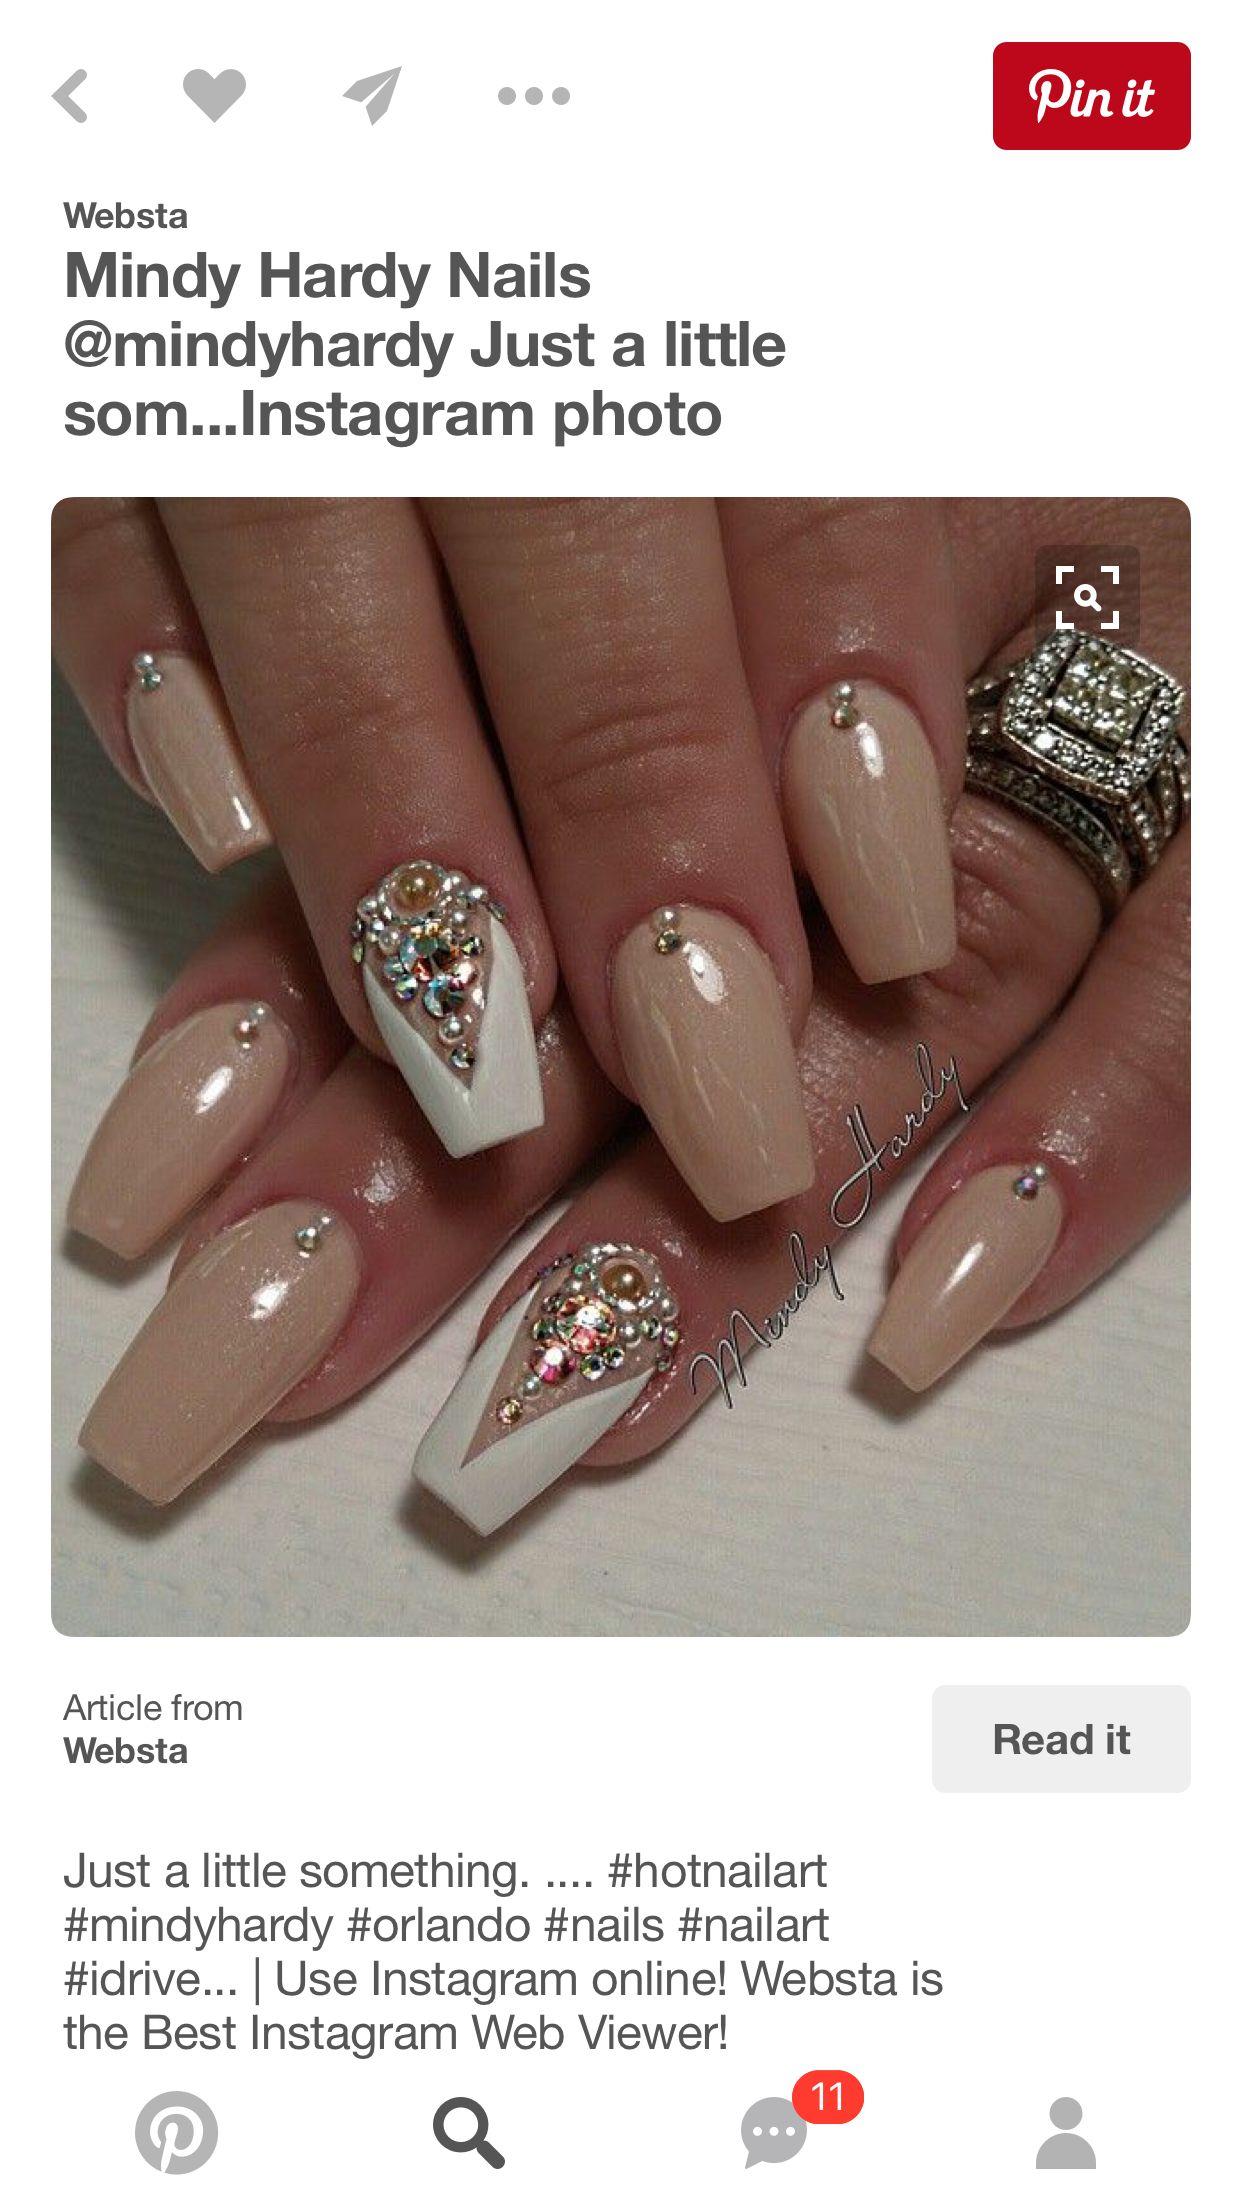 Pin by cheree cloud on My mani inspo✨ | Pinterest | Short nails